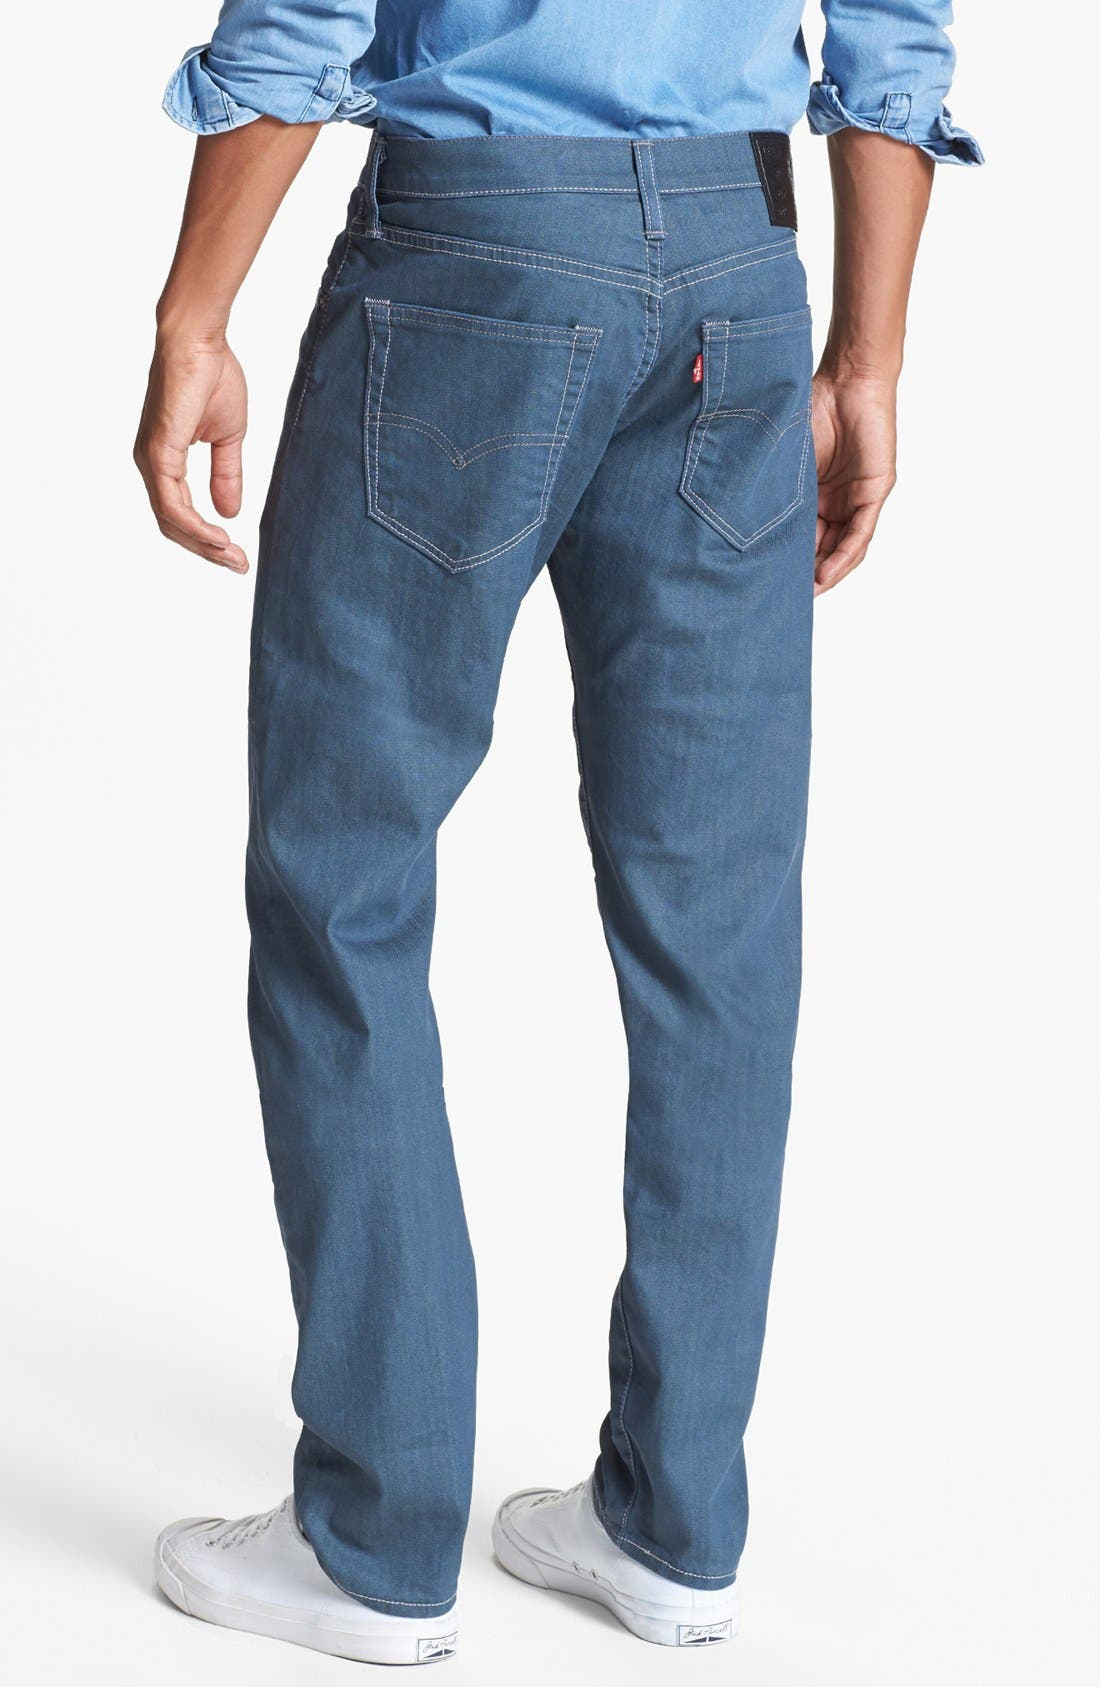 Main Image - Levi's® '508™' Skinny Fit Jeans (Nebula)